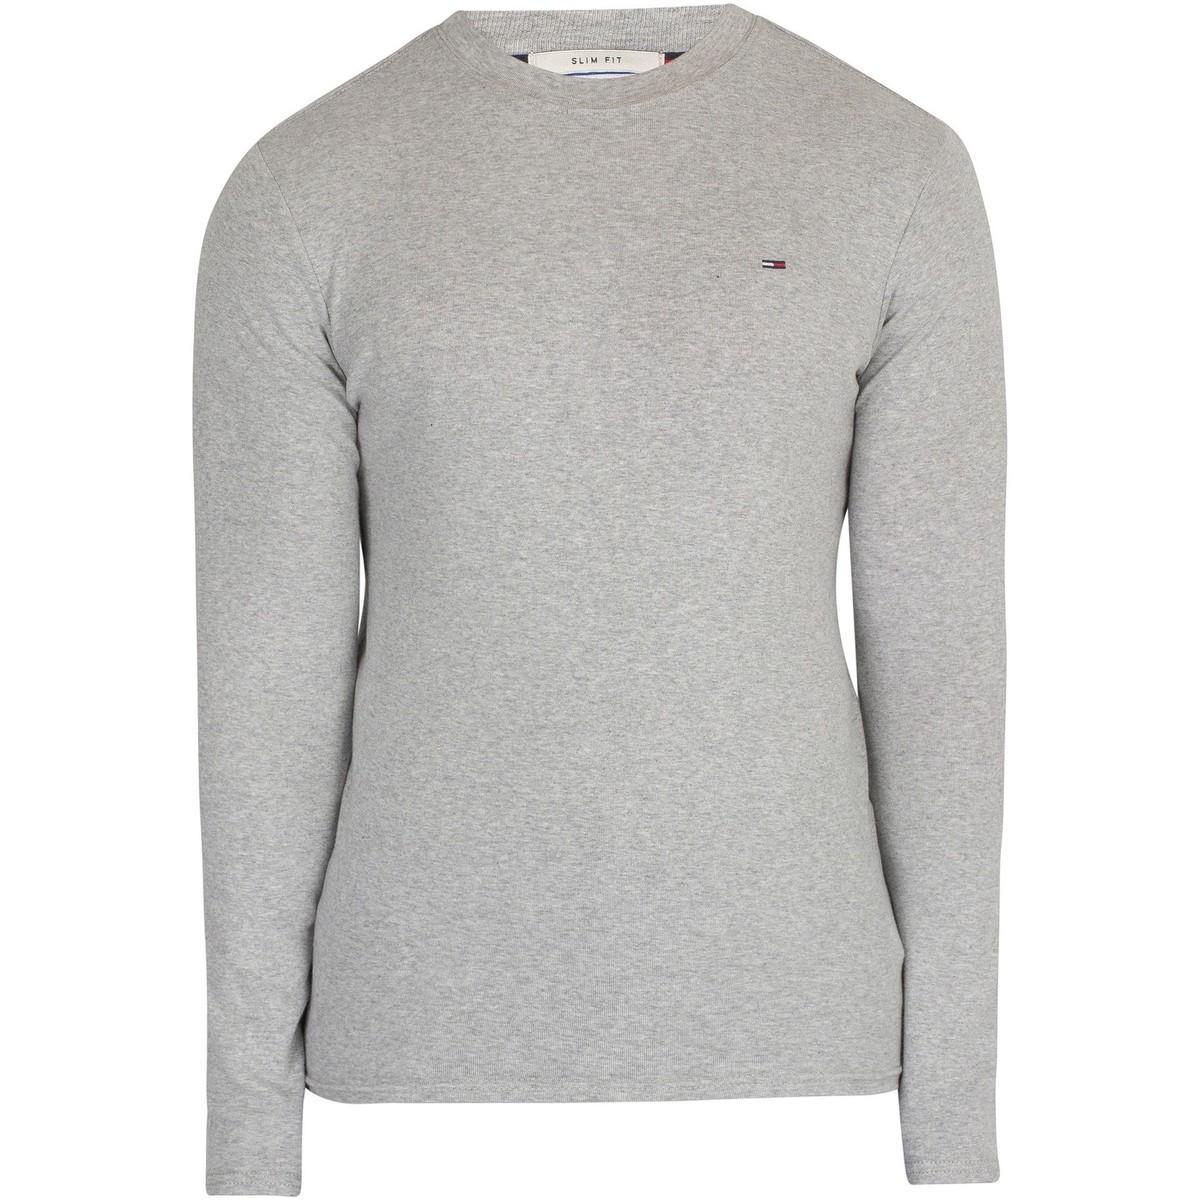 cf405ae9 Tommy Hilfiger Men's Slim Rib Longsleeved T-shirt, Grey Men's ...